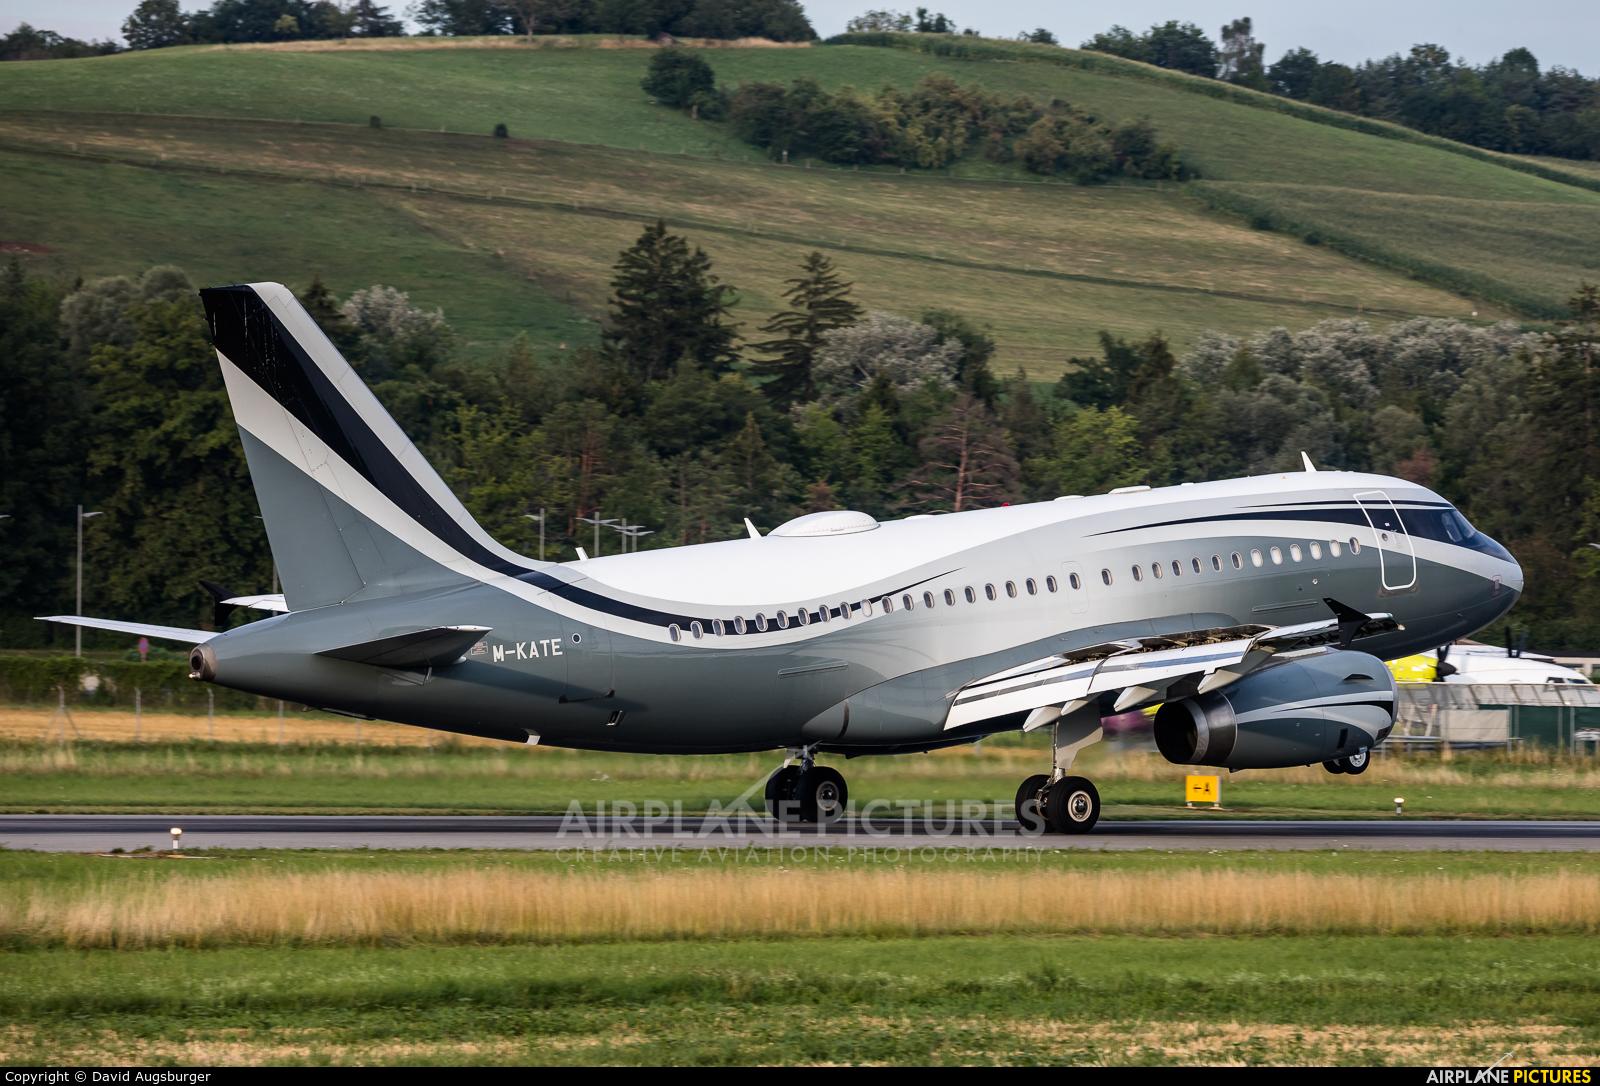 Private M-KATE aircraft at Bern - Belp